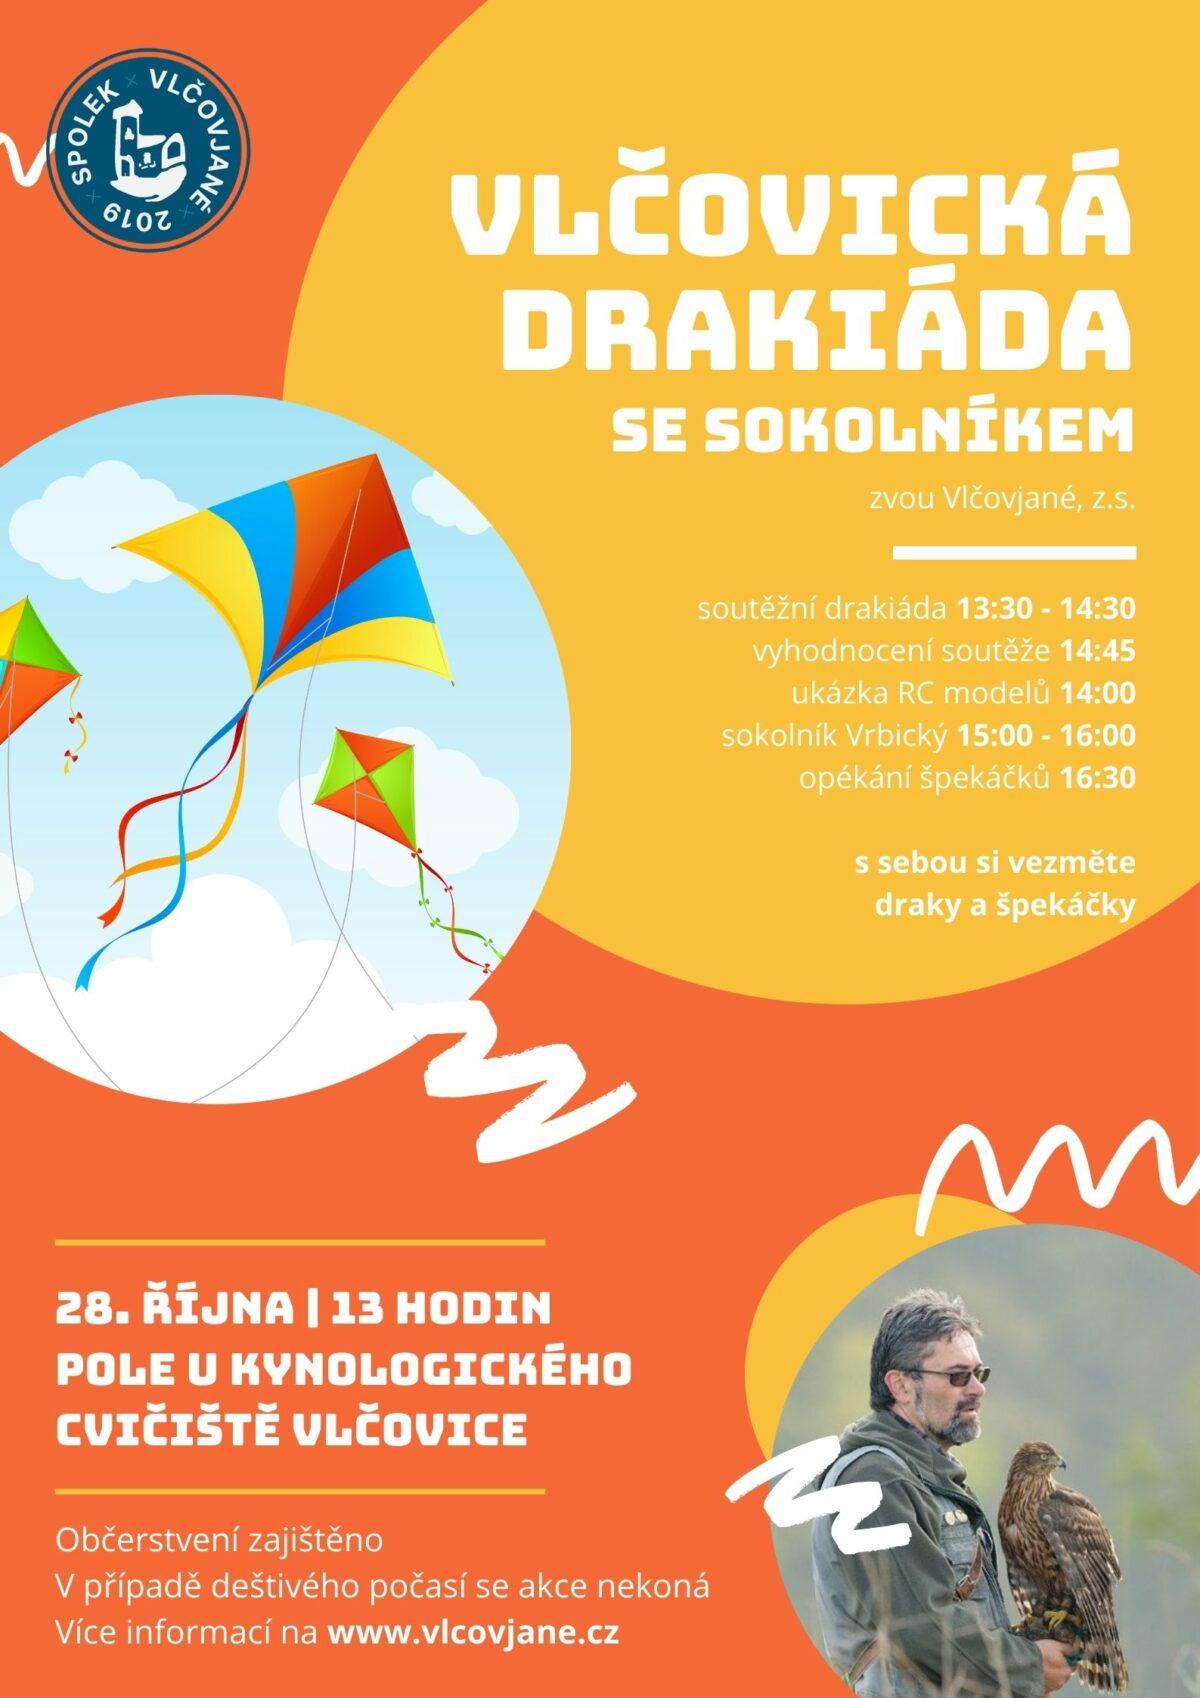 Vlčovická drakiáda 2021 - Vlčovjané z.s.